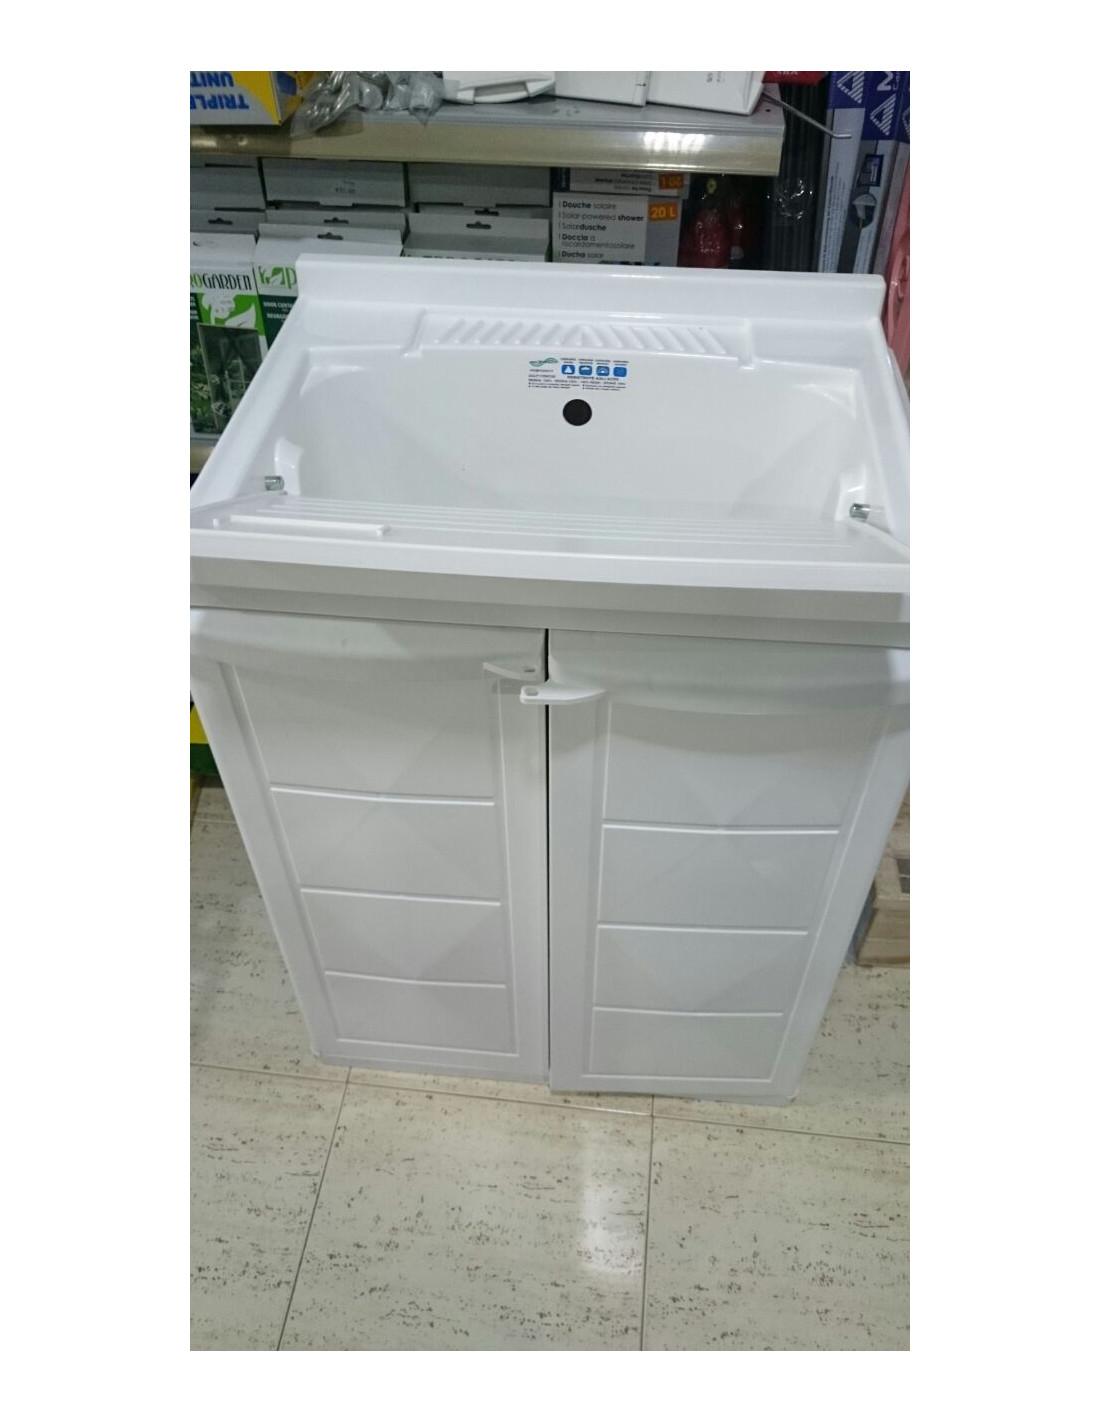 Mueble armario de resina con fregadero incorporado - Muebles para fregaderos ...